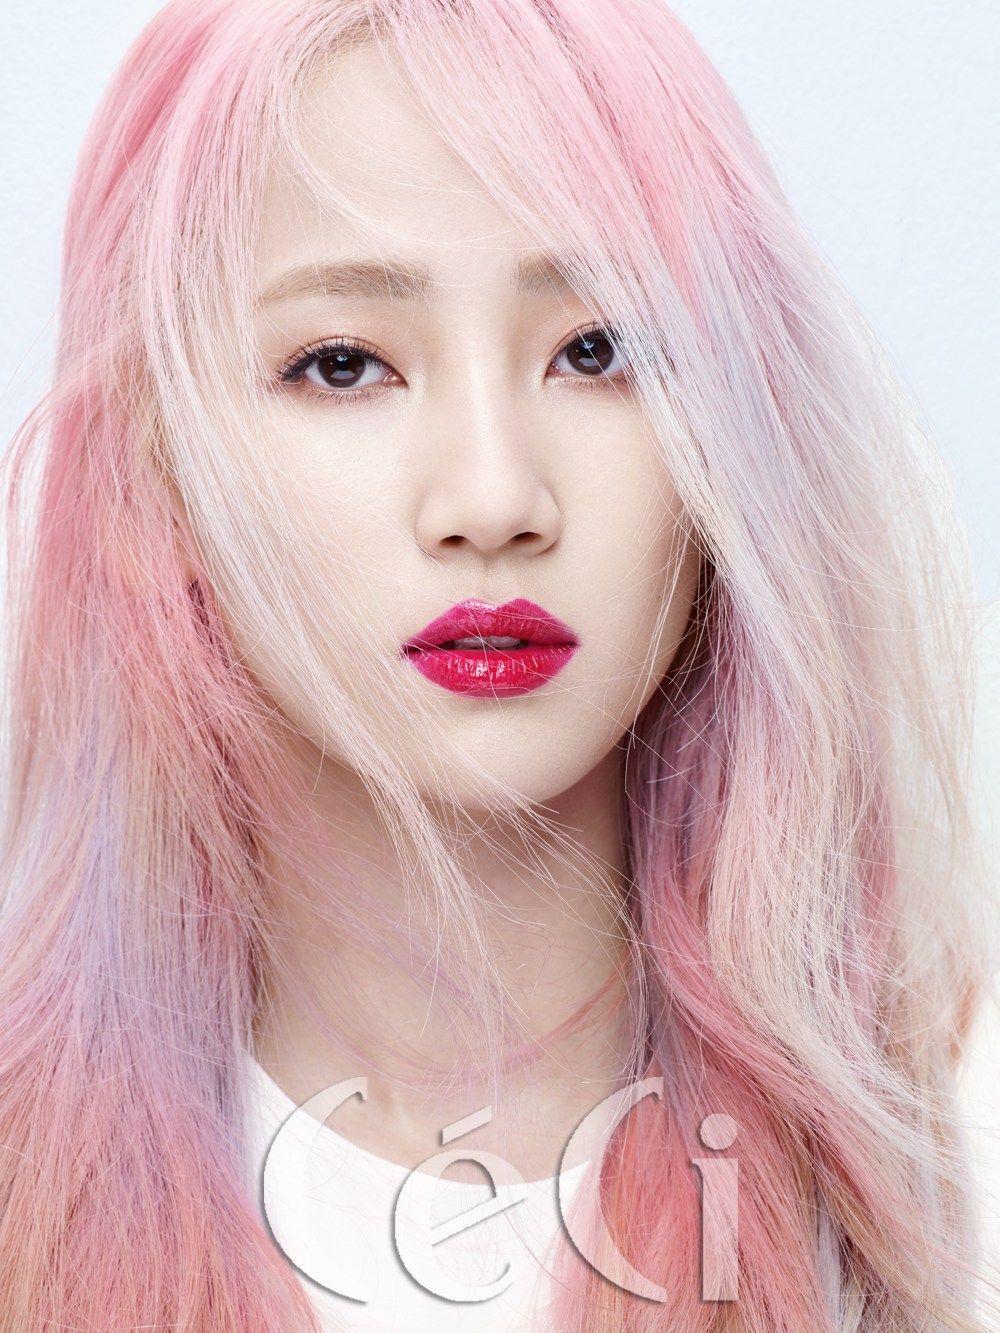 hyerim, yeeun & sunmi – ceci photoshoot | korean beauties